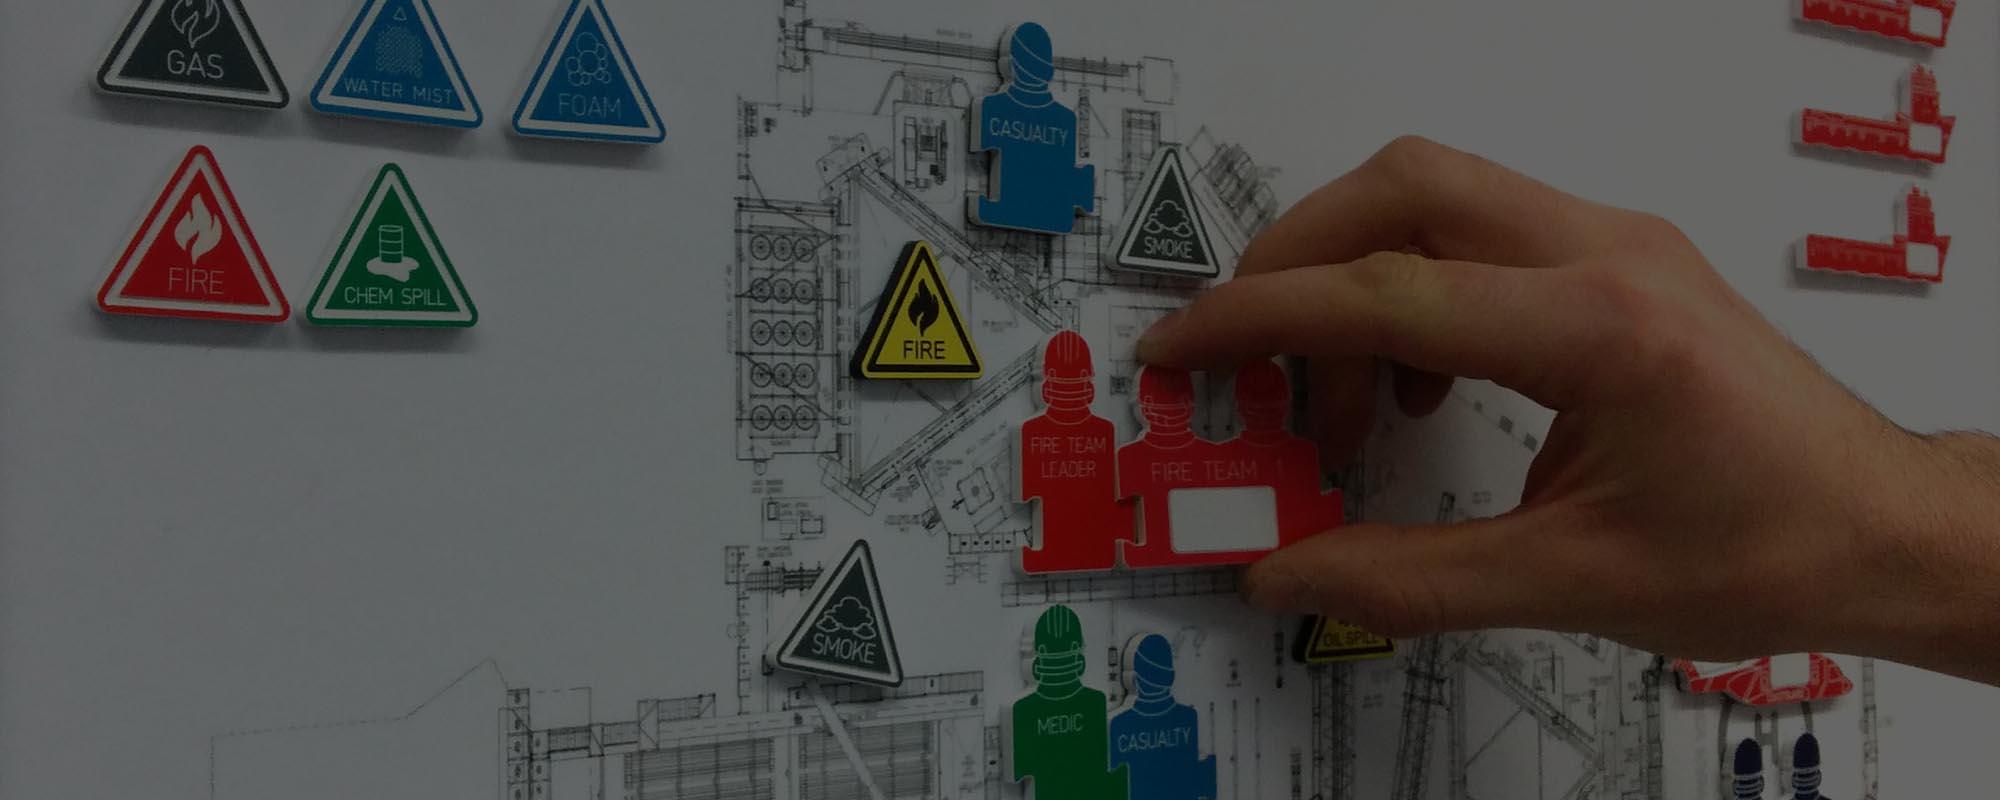 Emergency Response Planning & Management